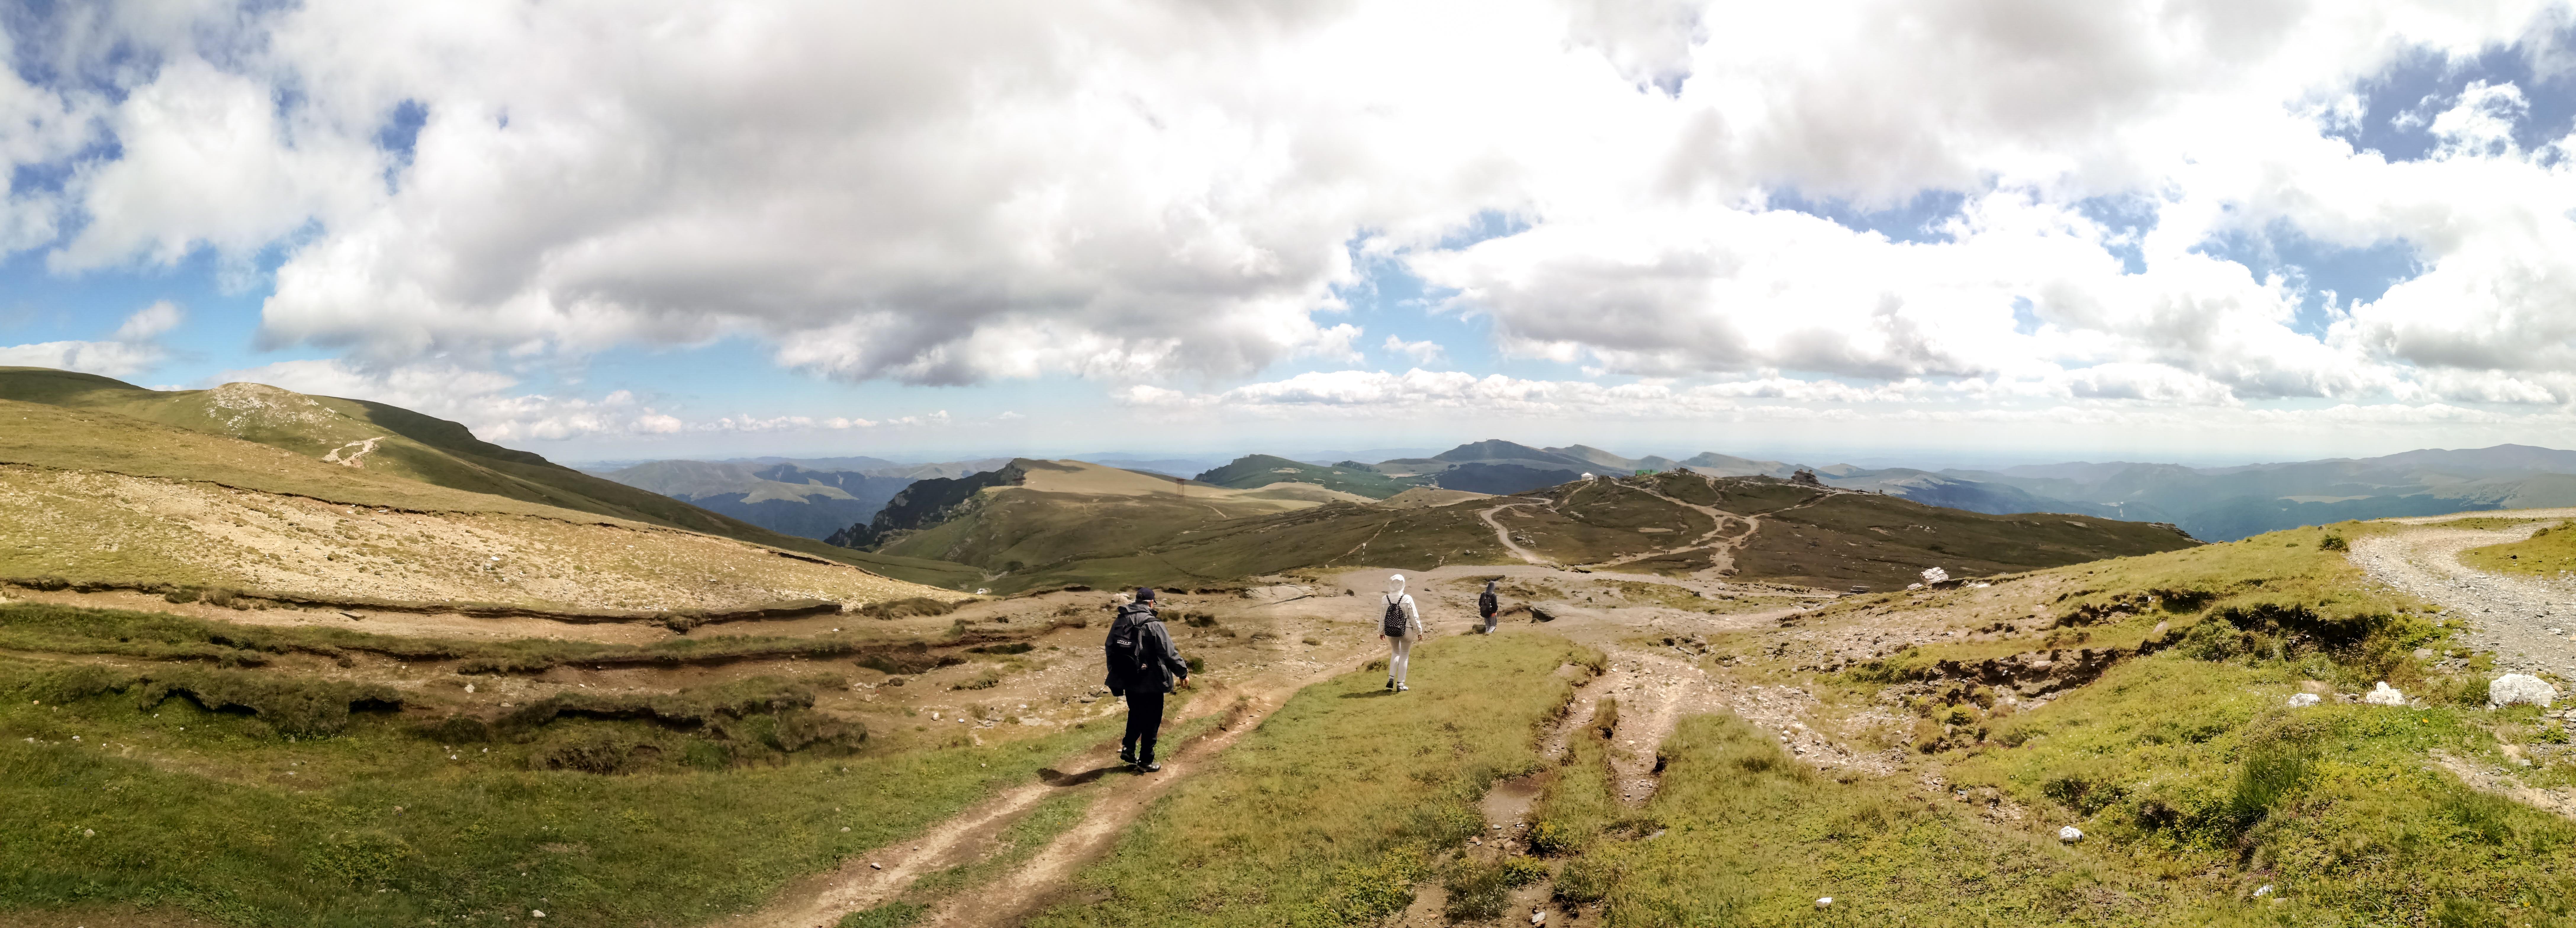 Bucegi Plateau